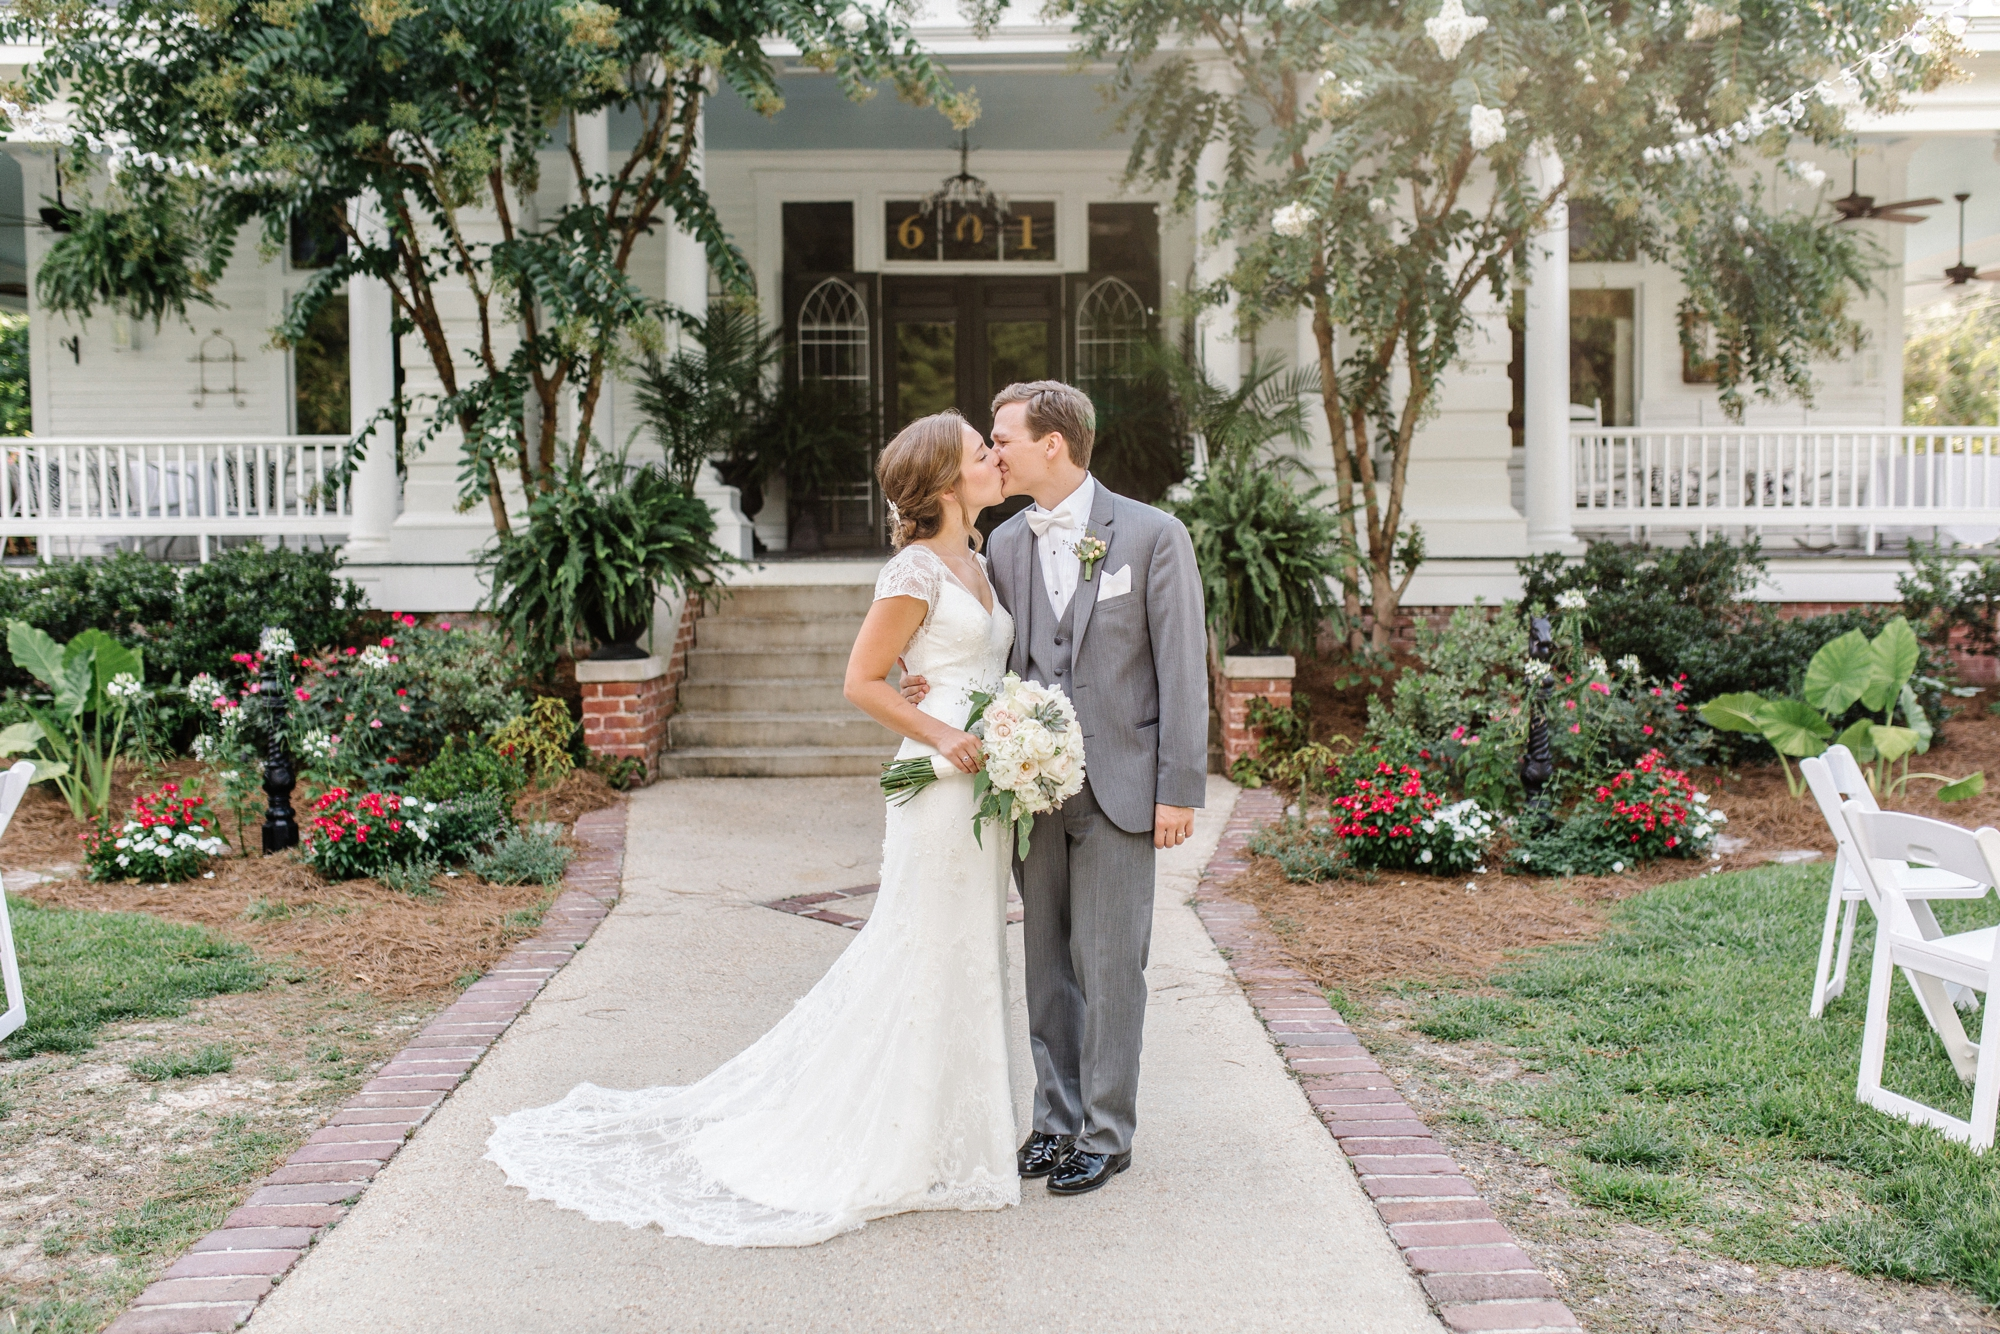 New_Orleans_Wedding_Photographer_1645.jpg